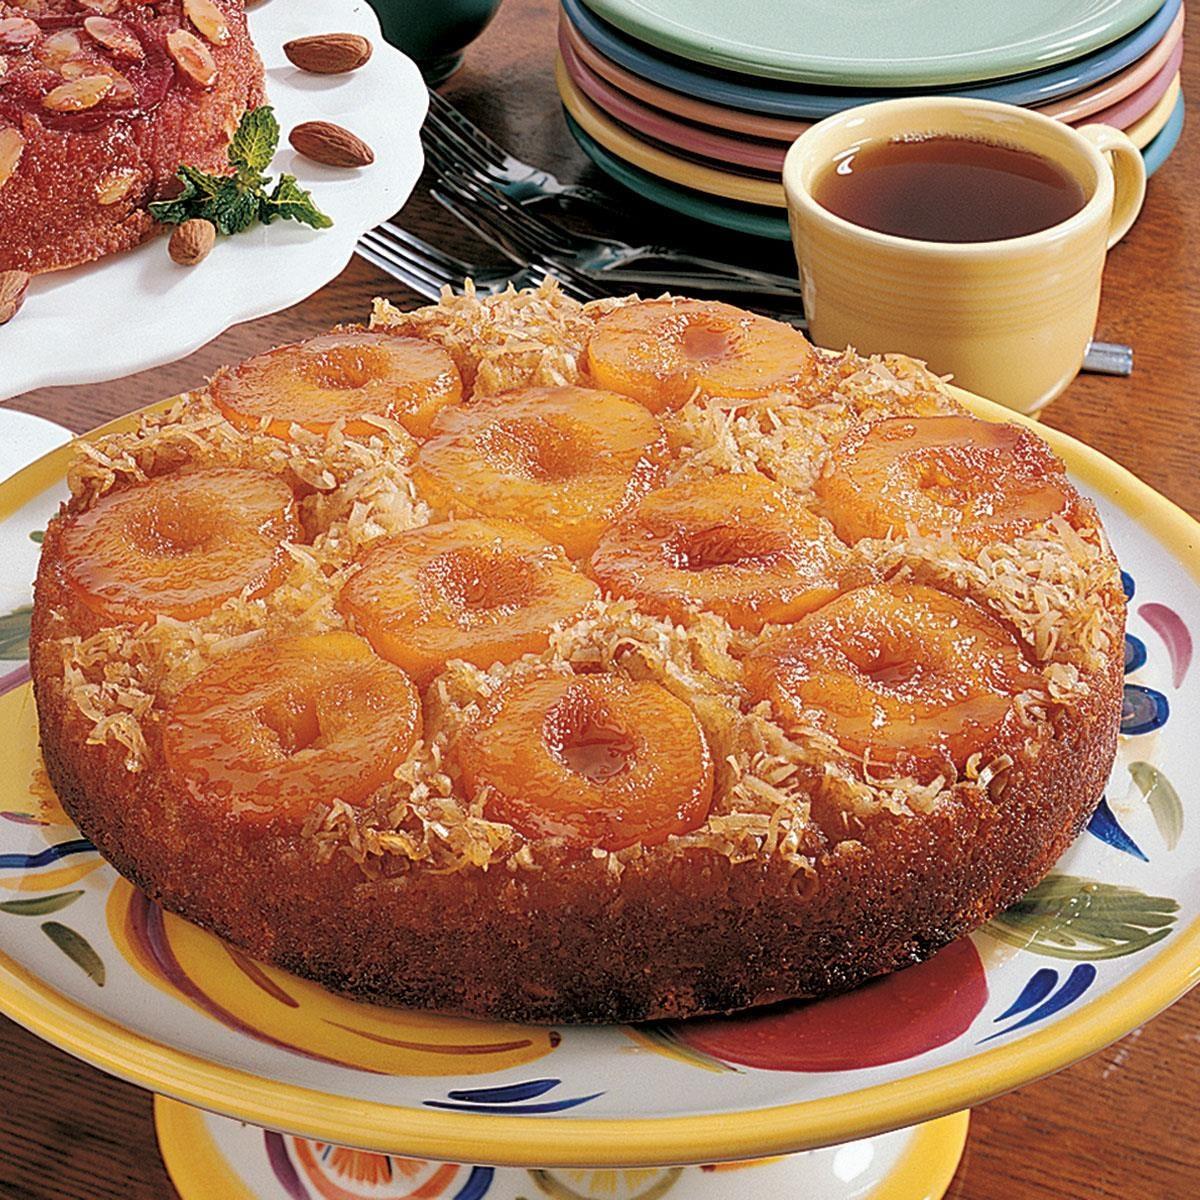 Taste Of Home Magazine Peach Cake